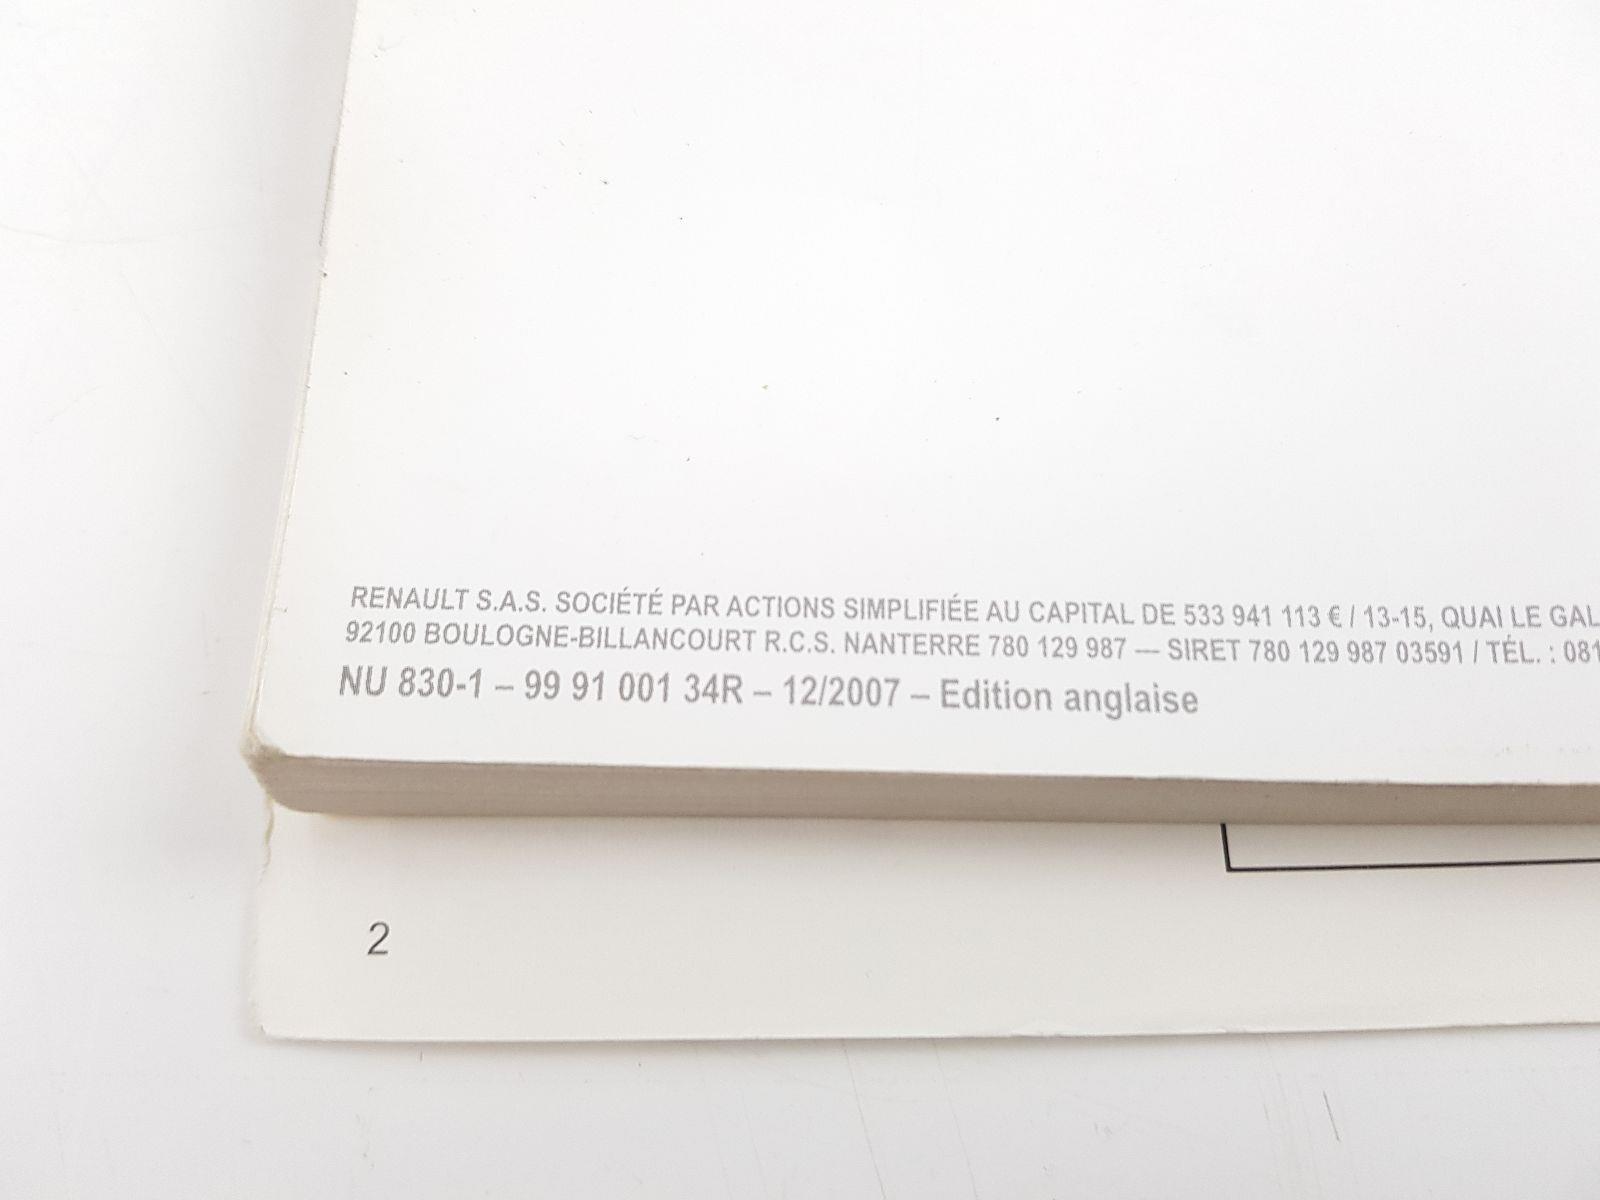 renault koleos 2008 to 2010 book pack diesel manual for sale rh scbvehicledismantlers co uk 2008 Renault Koleos Renault Koleos Interior